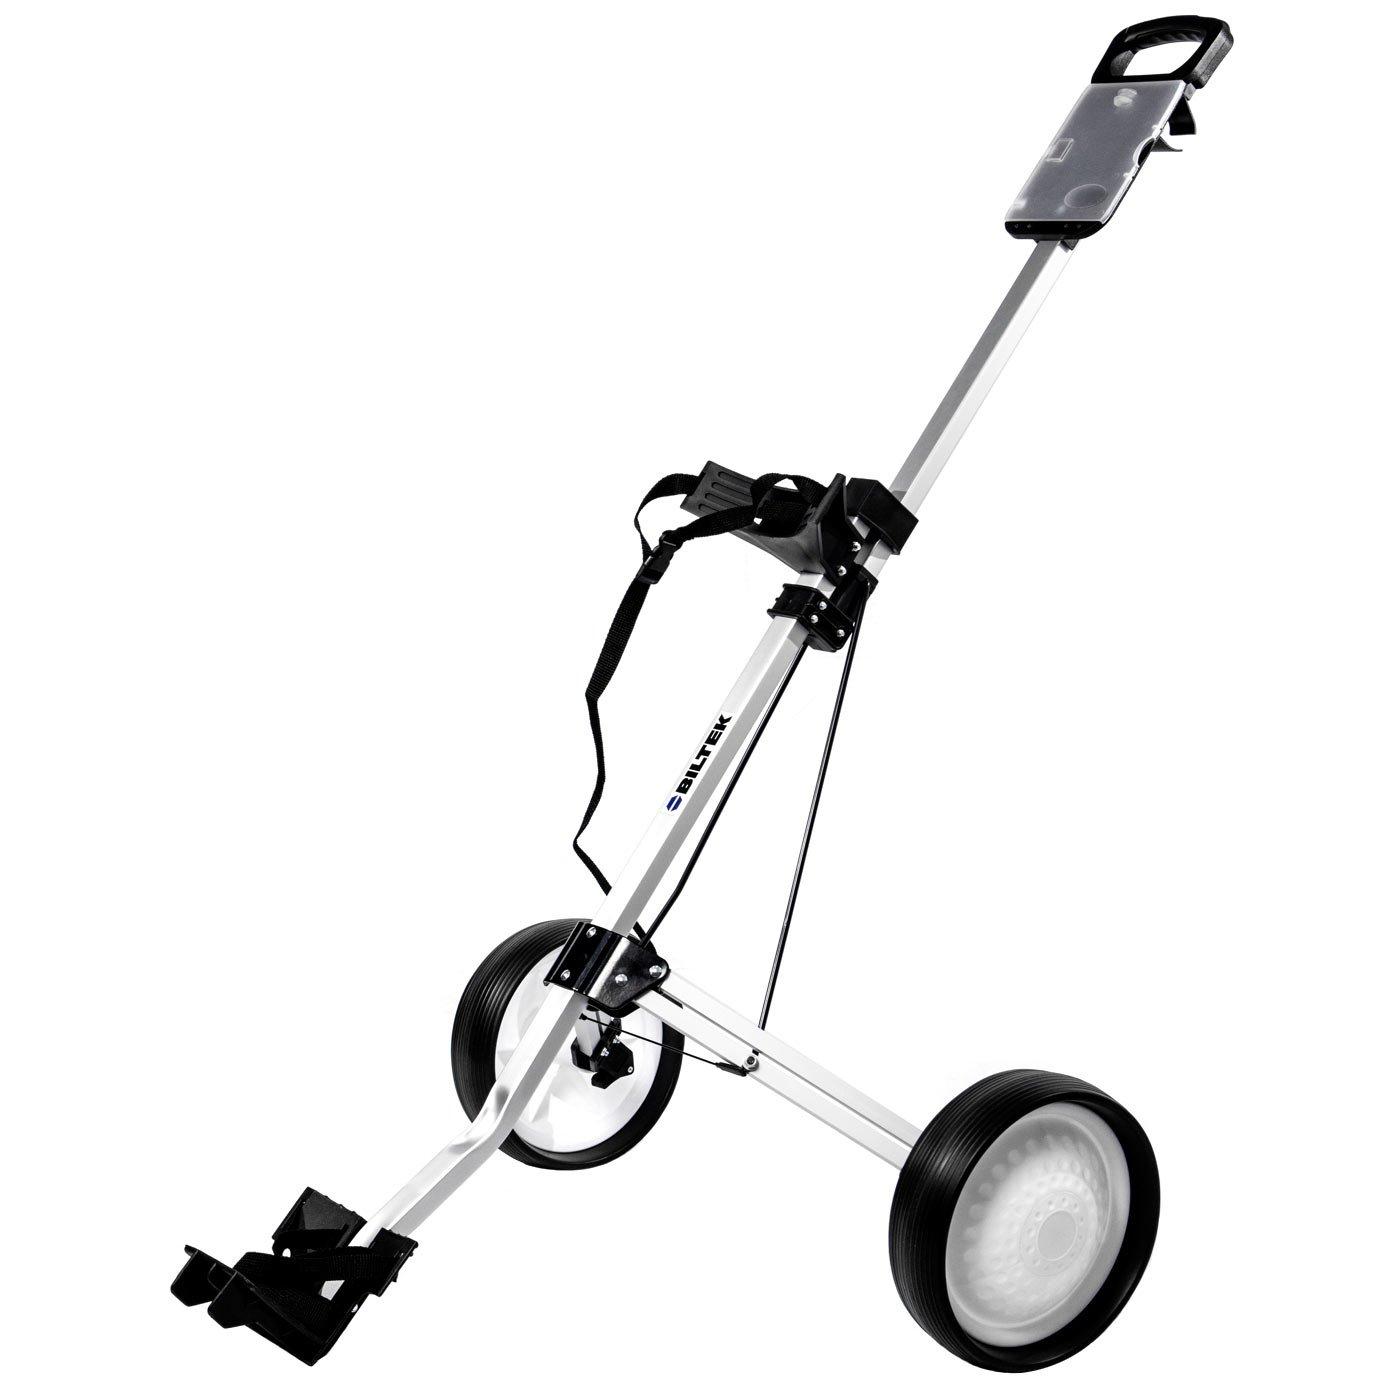 Biltek Golf Push Cart - Foldable 2-Wheeled Push Pull Golf Cart Trolley - Silver